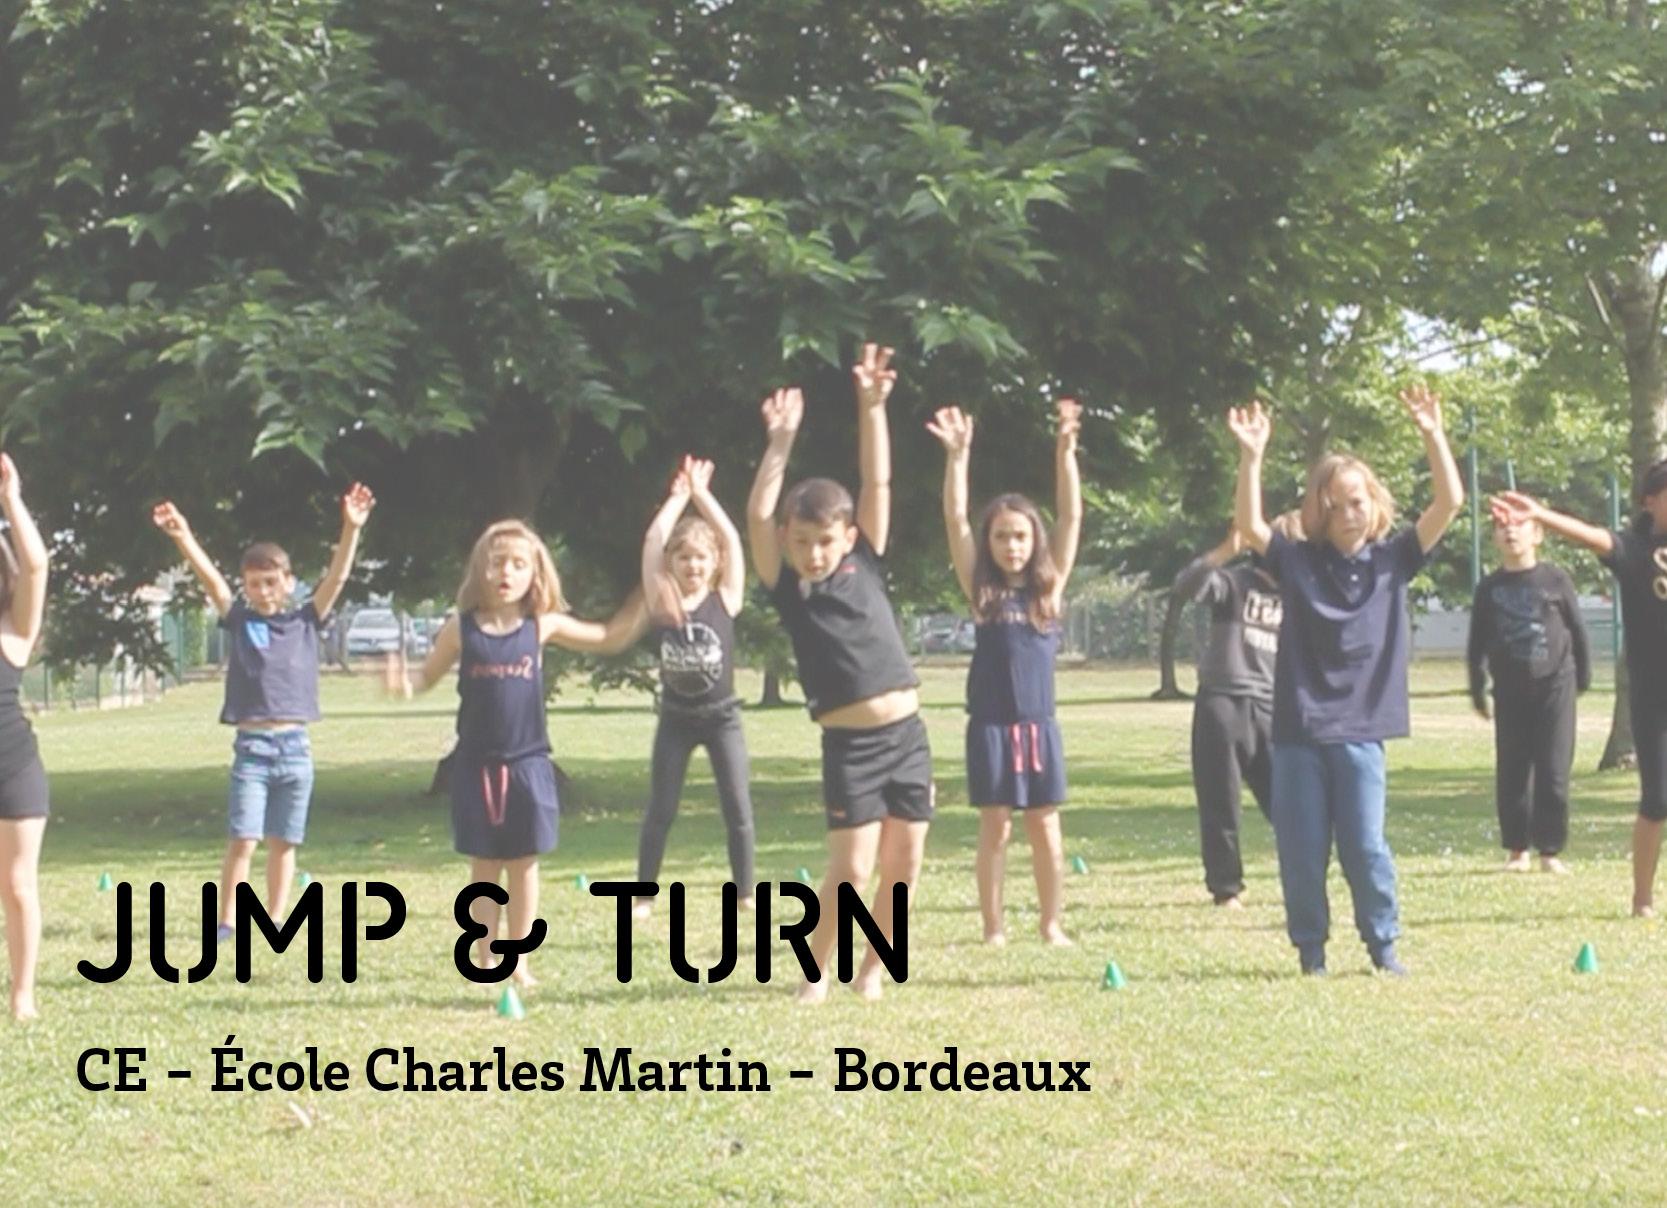 CE Charles MArtin Bordeaux